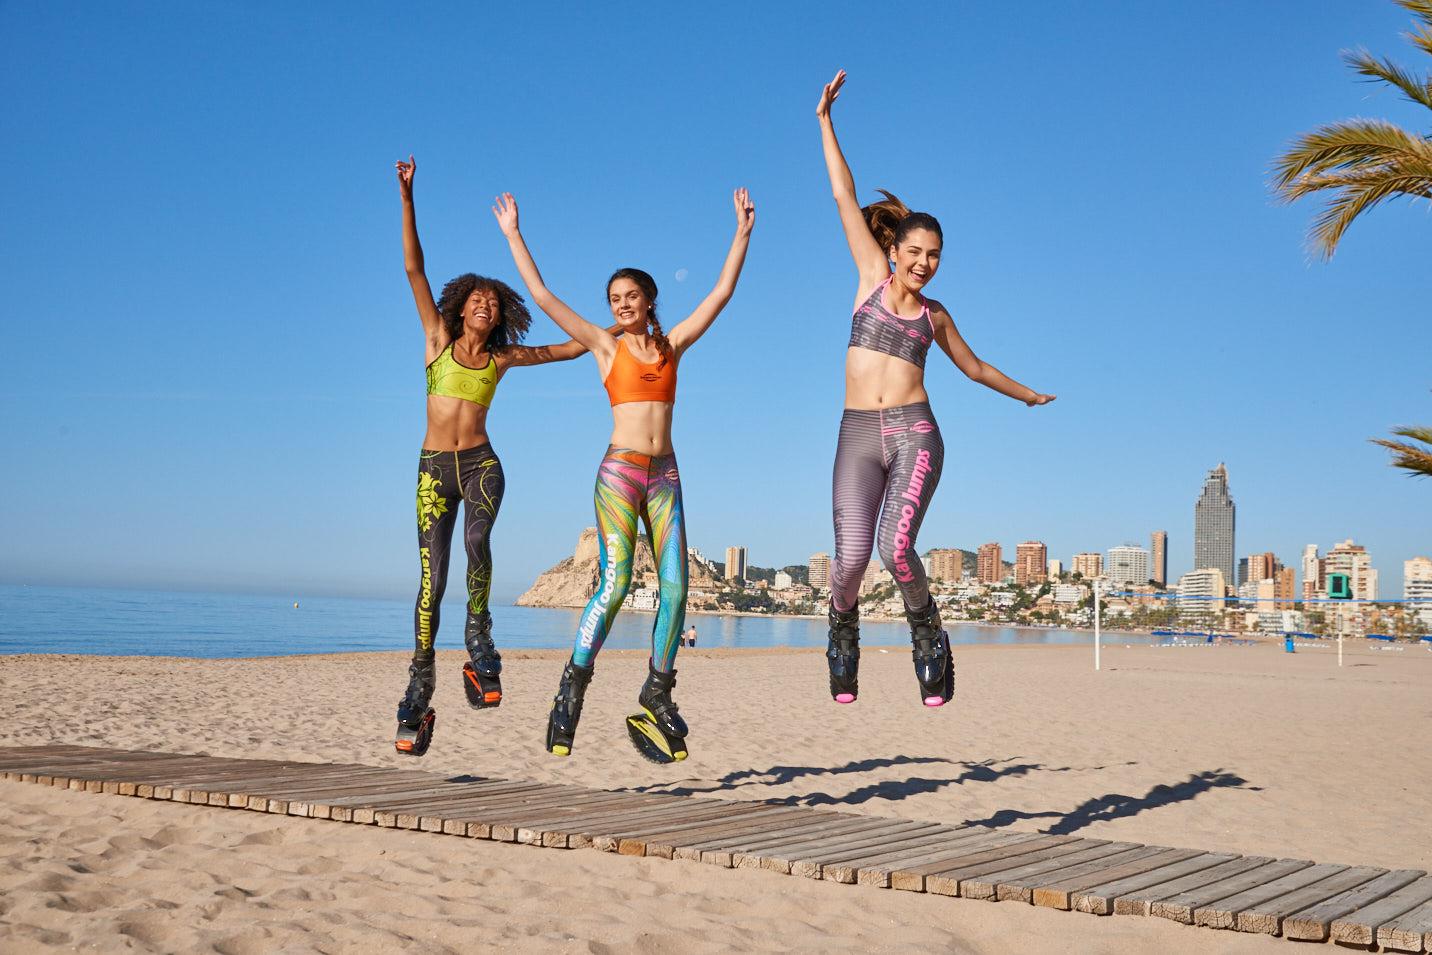 3 girls jumping W Legging.jpg